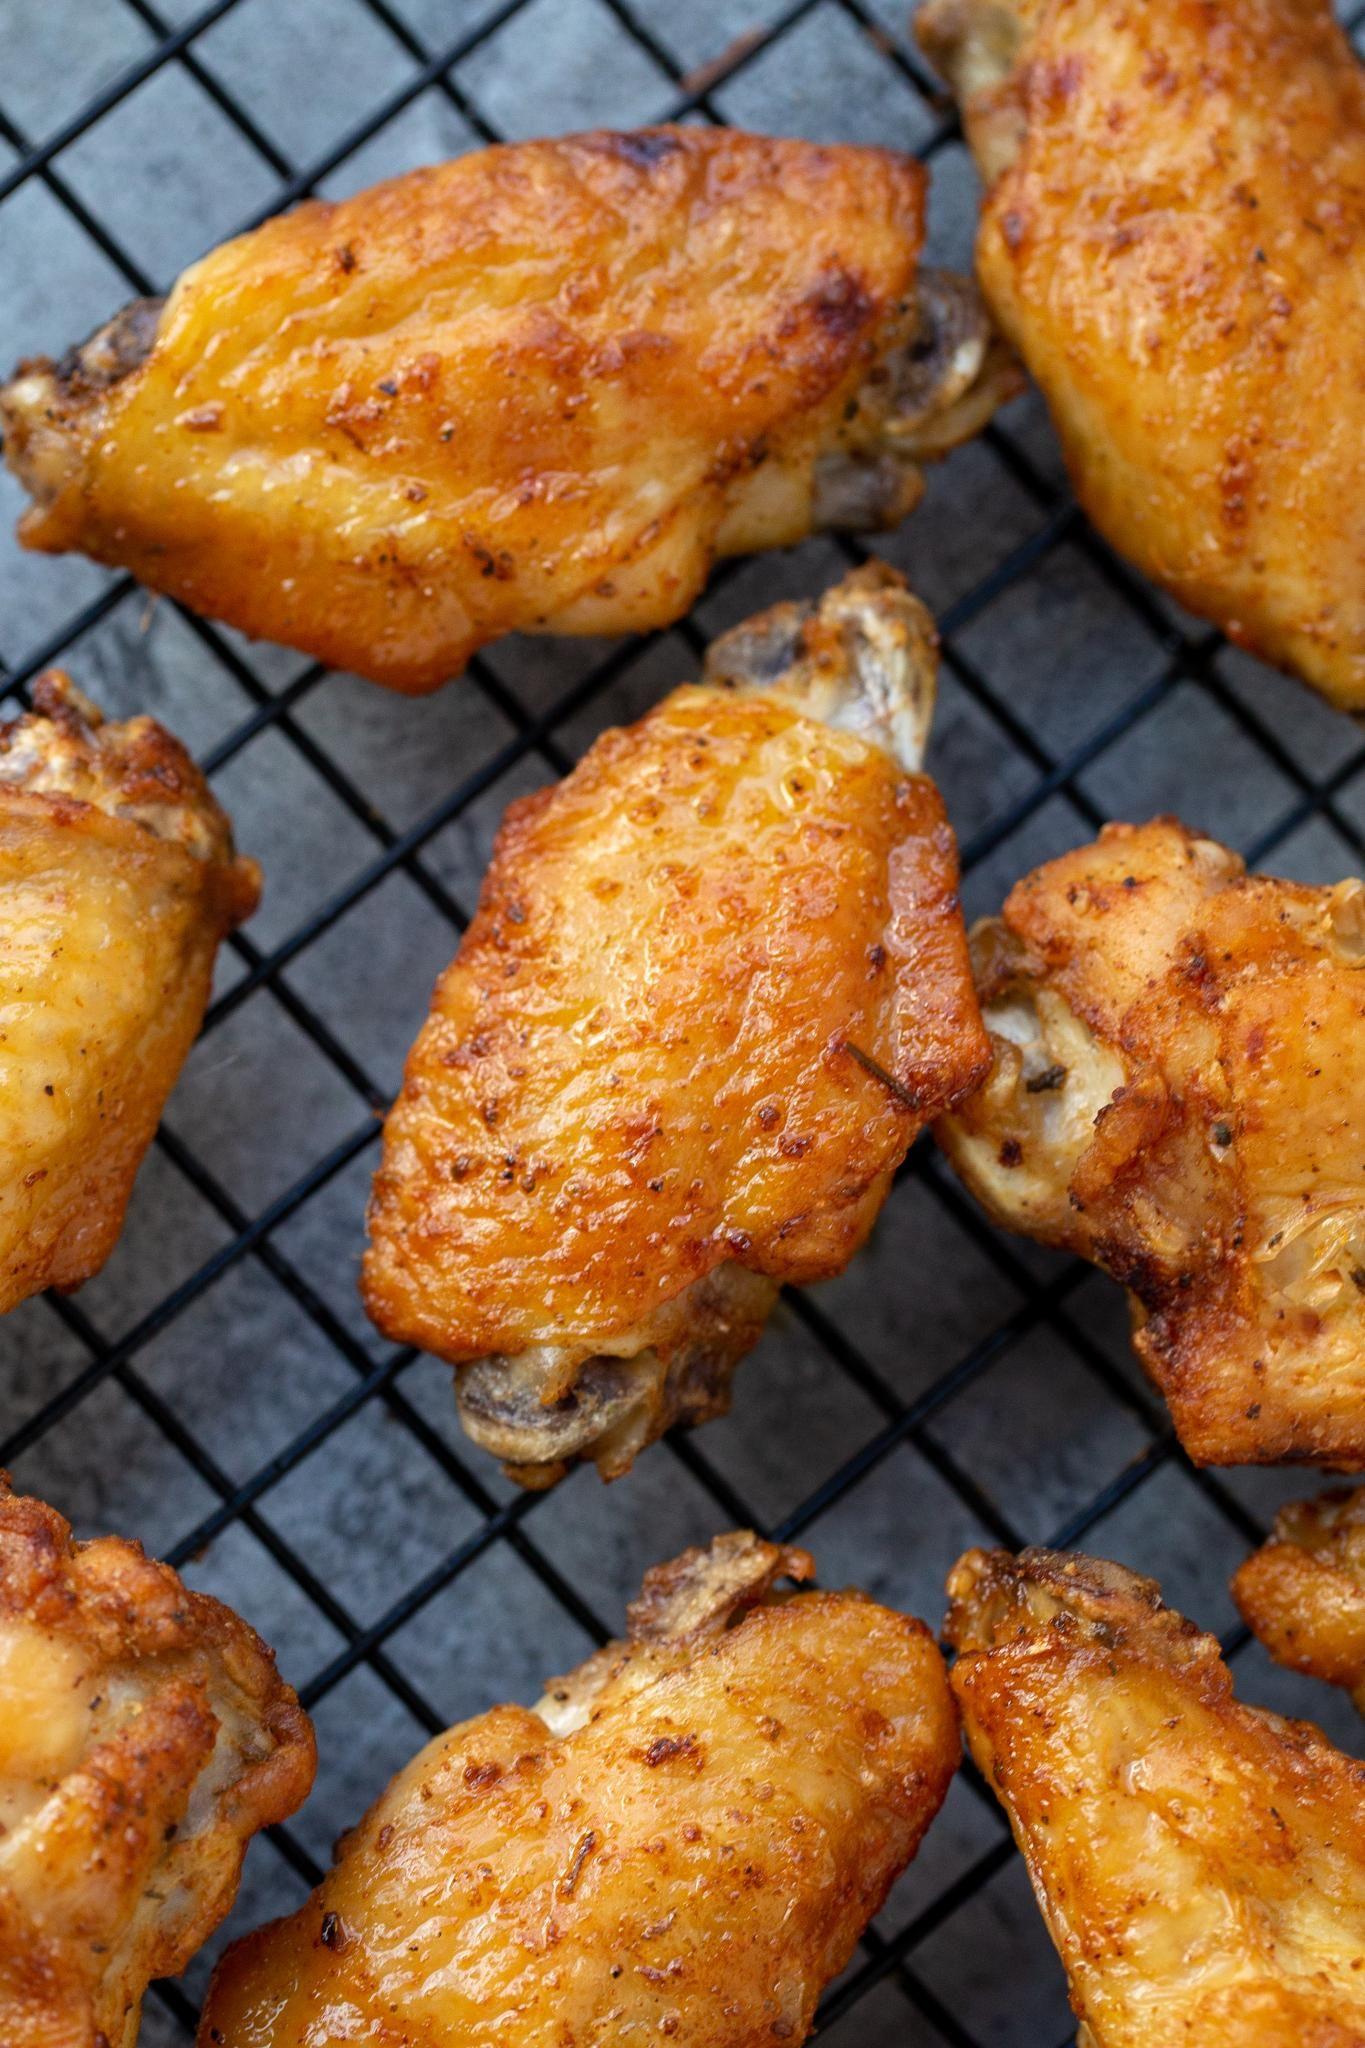 Air fryer recipes momsdish air fryer recipes healthy